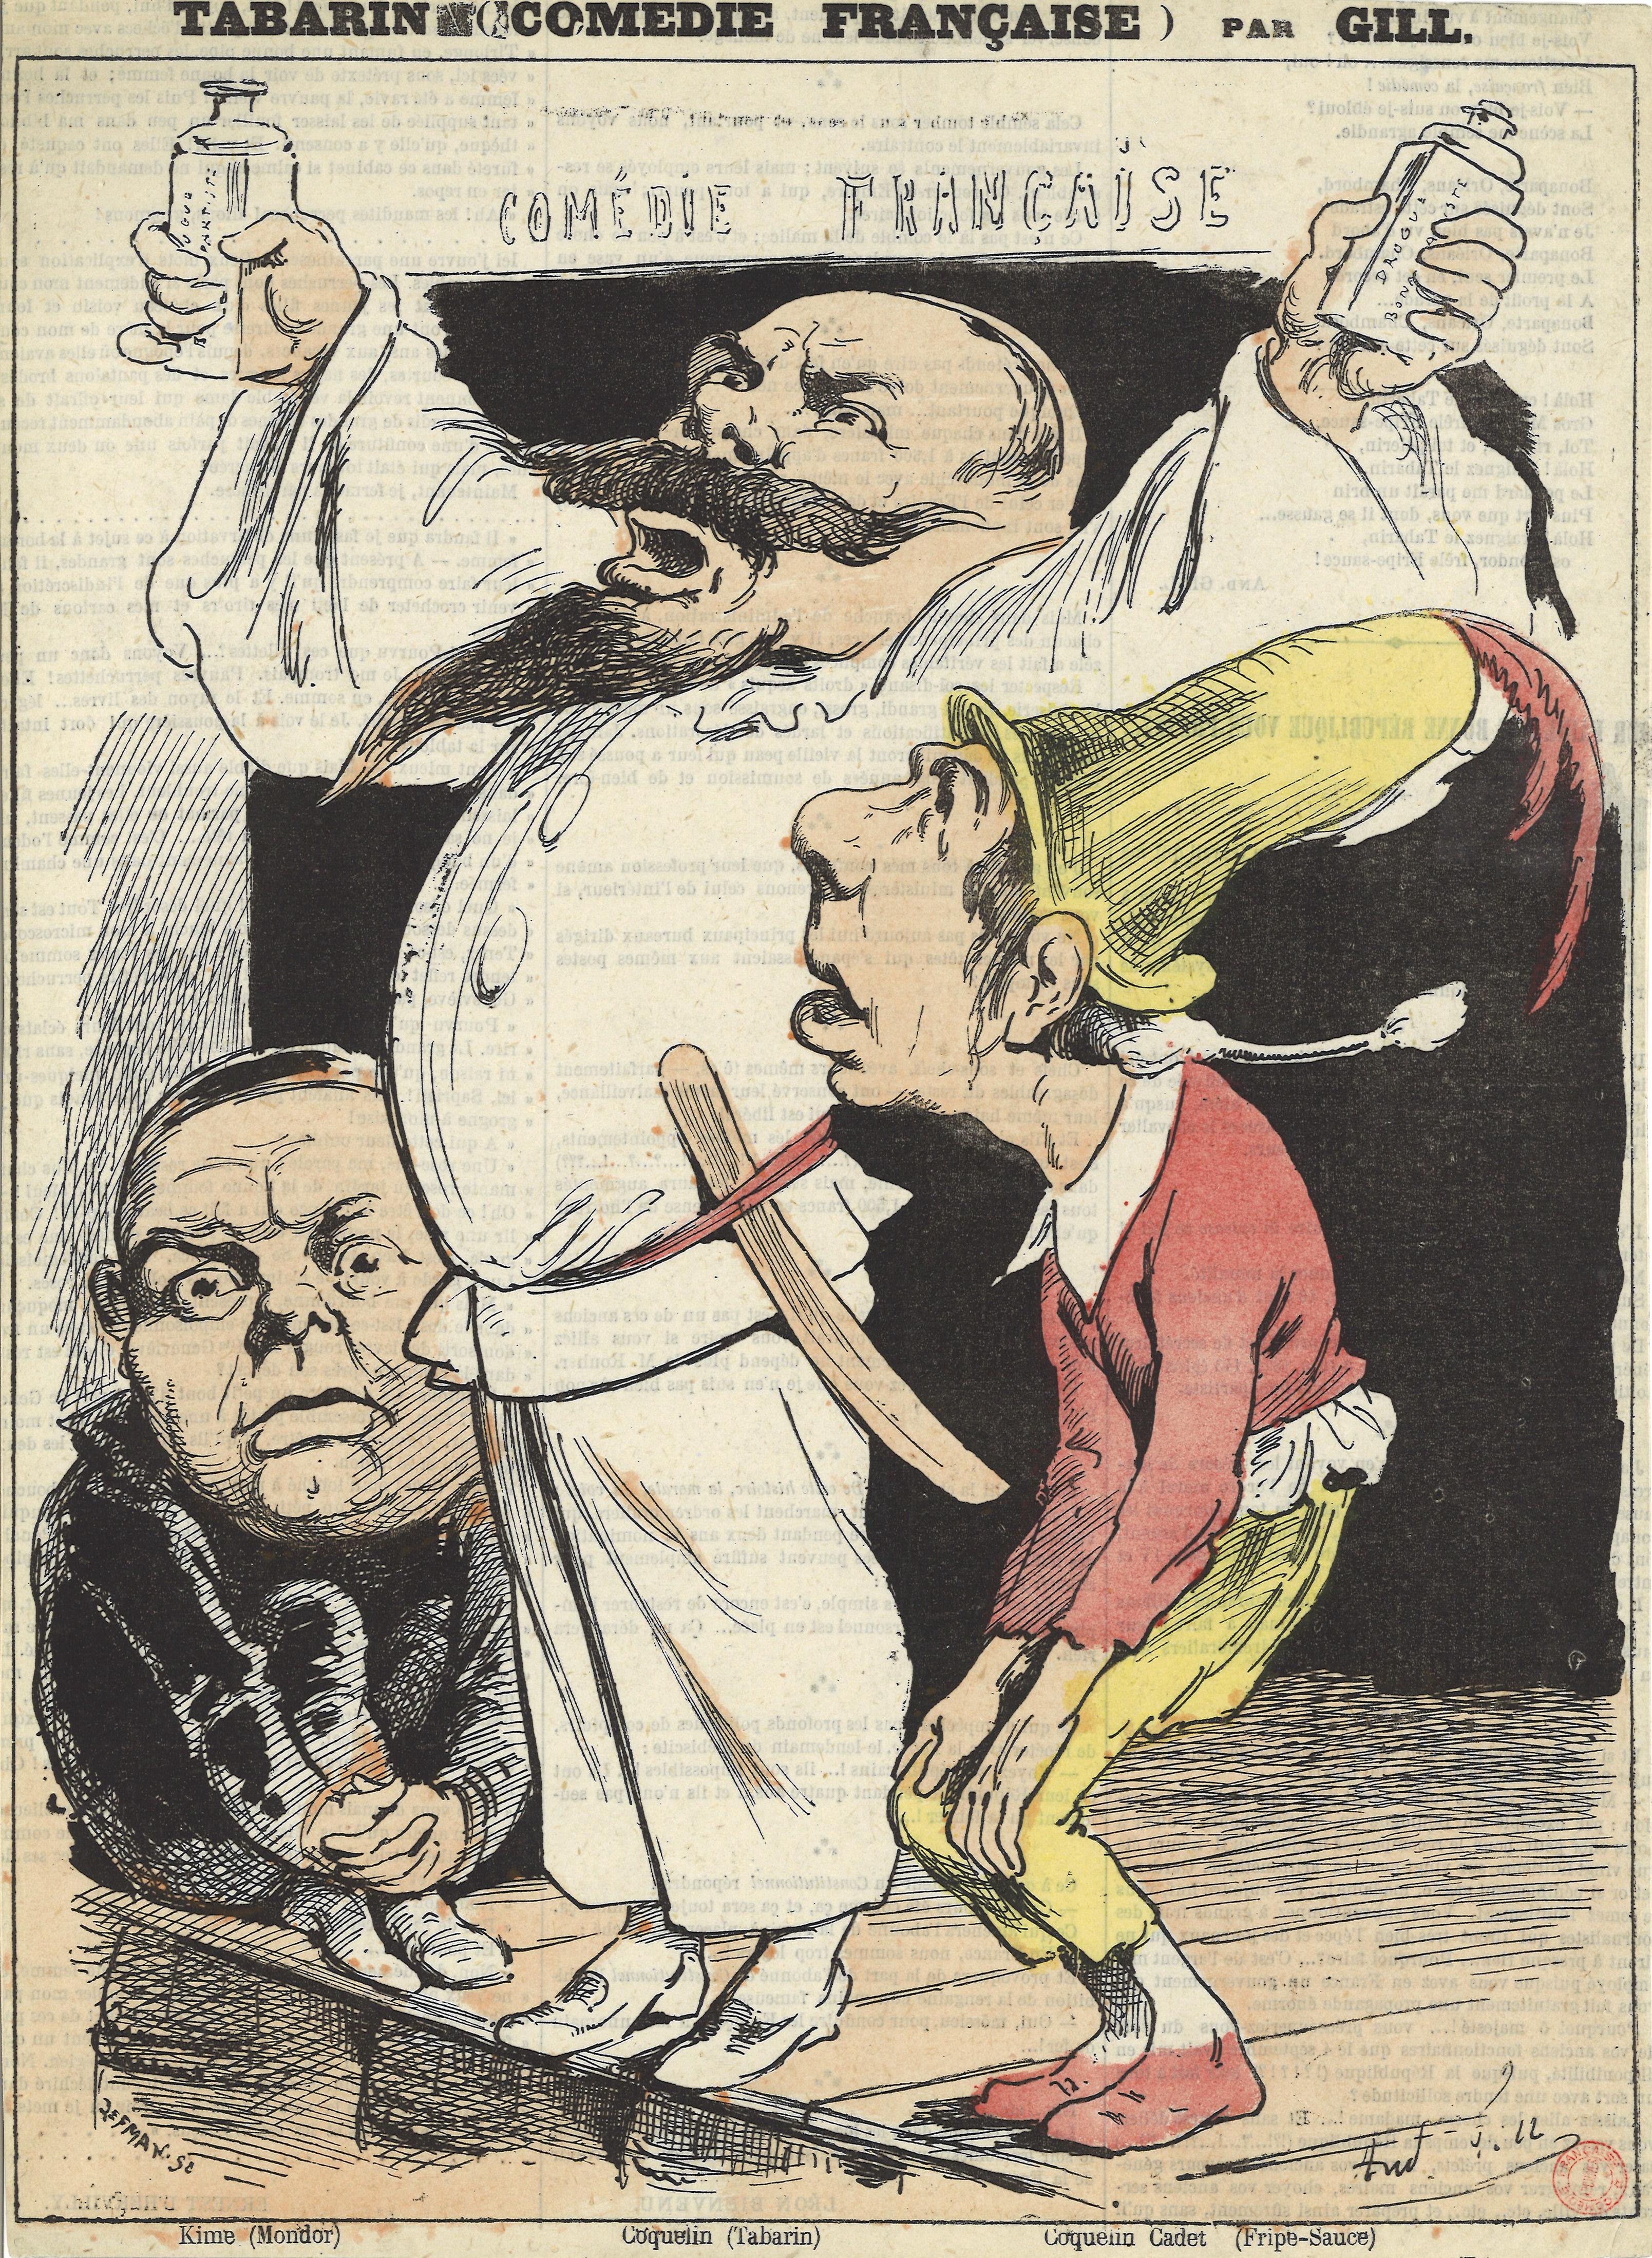 17-tabarin-caricature-par-gill-1874-